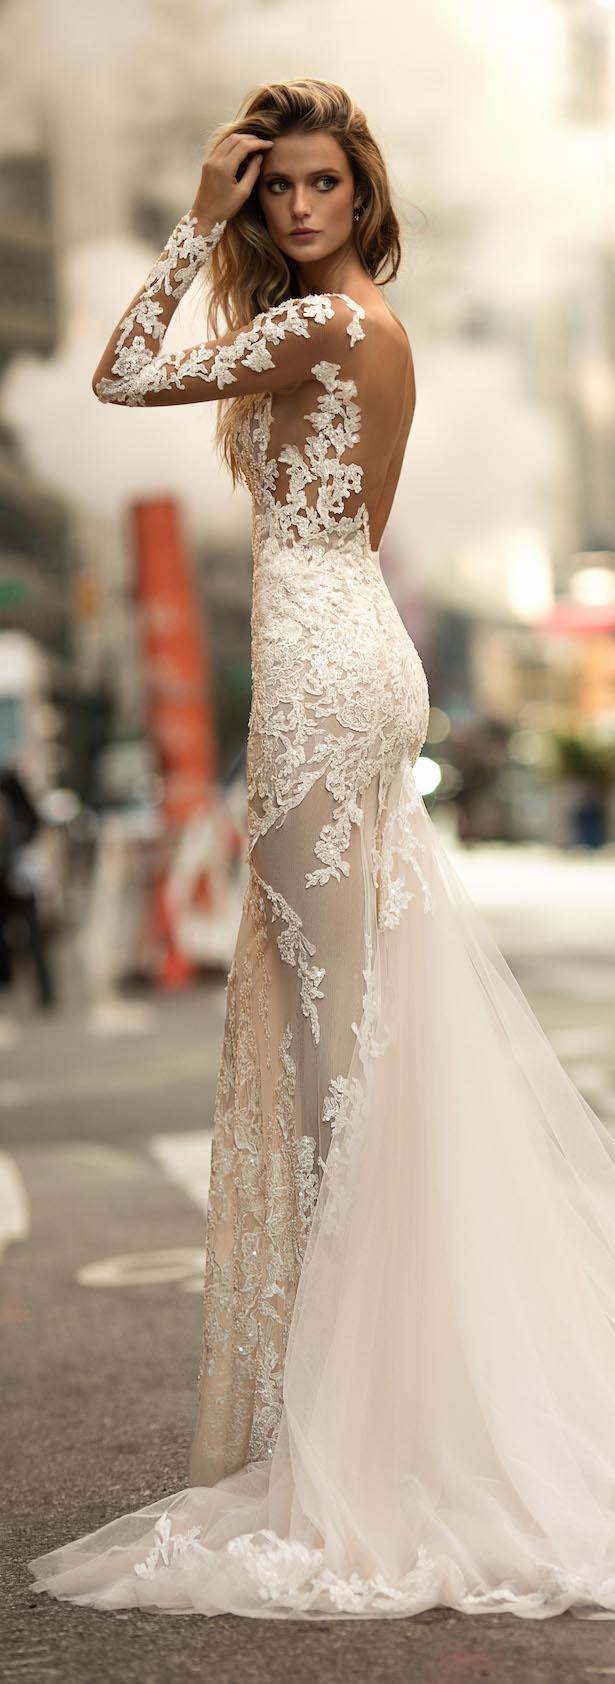 winter wedding dresses wedding dress by berta bridal fall 2017 ezzoqbx